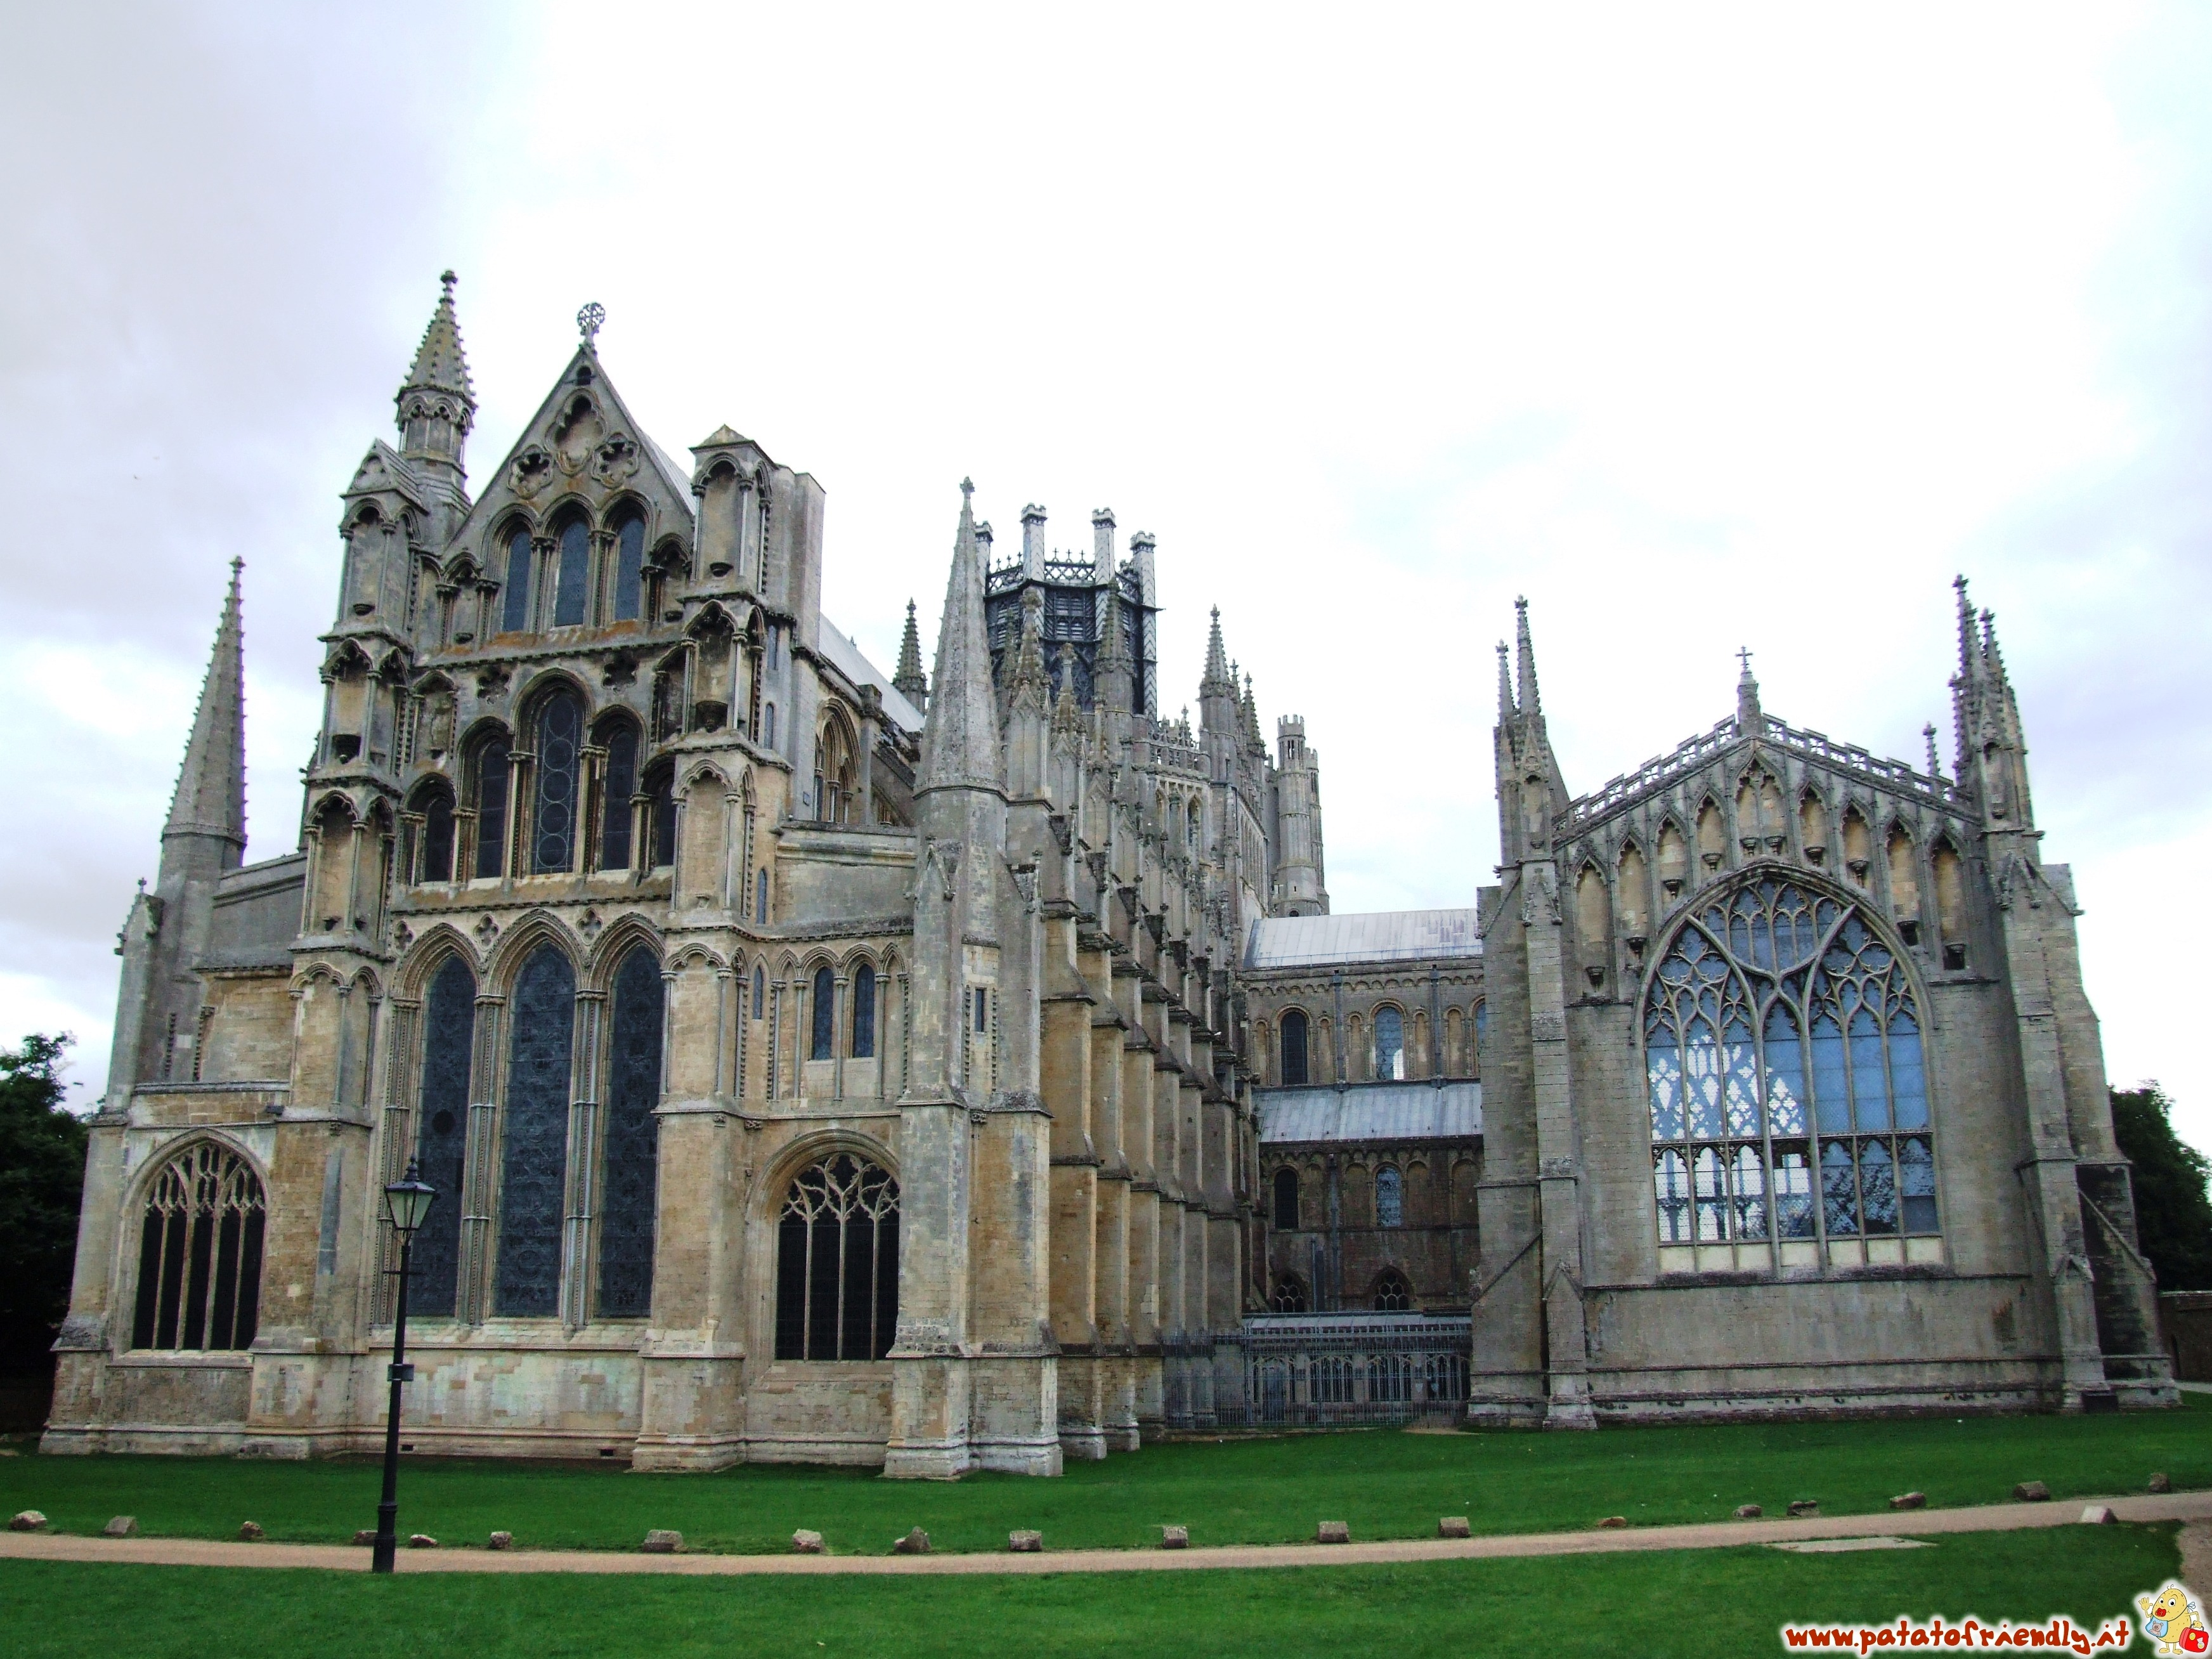 [cml_media_alt id='3730']La maestosa cattedrale di Ely[/cml_media_alt]